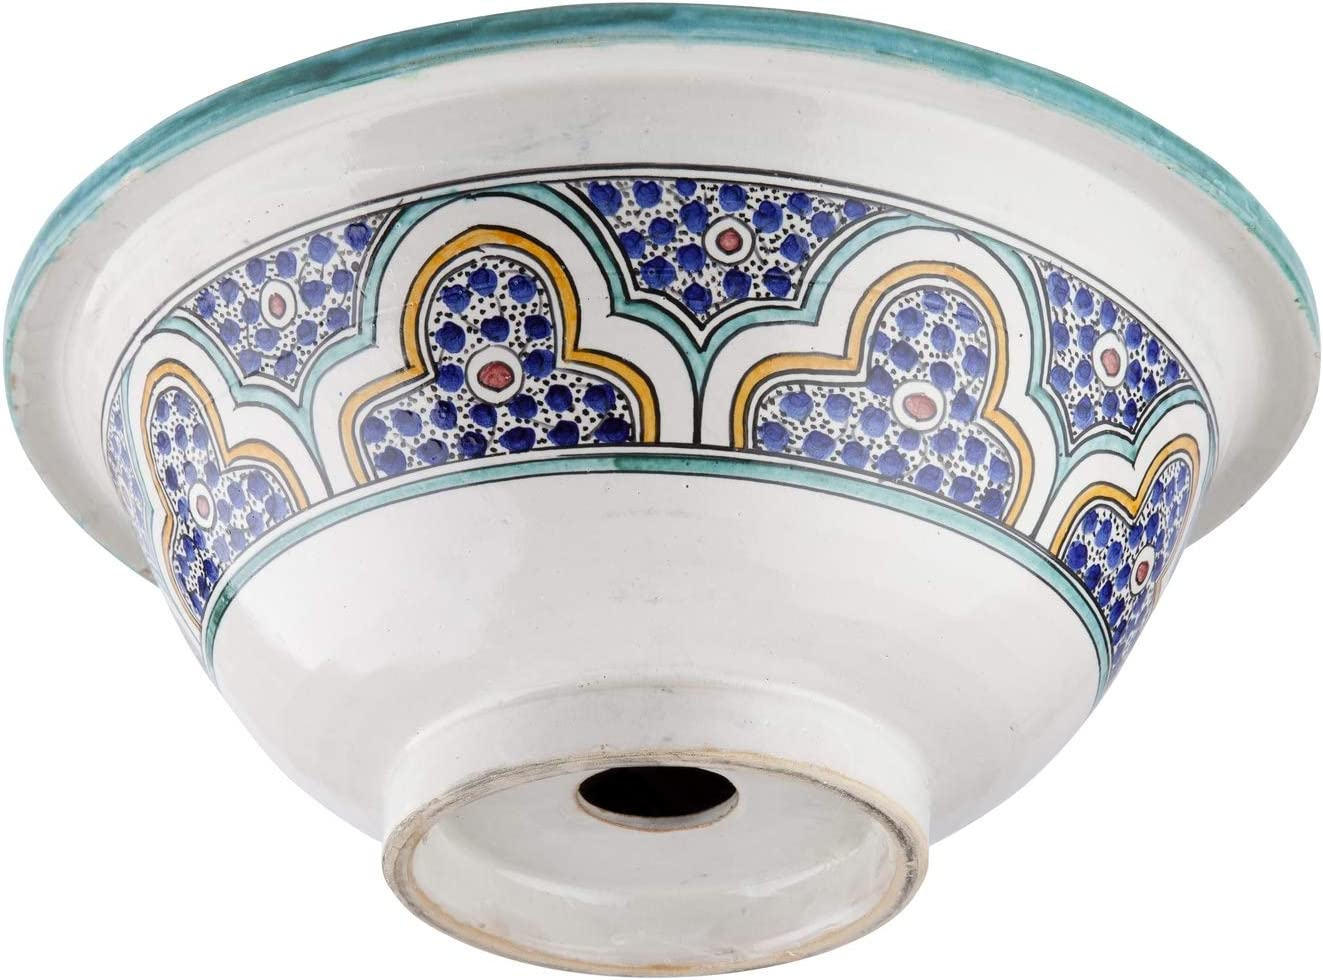 Countertop Washbasin 41 x 16 cm Ramila Cerames Moroccan Wash Basin Moroccan Built-In Sink for Bathrooms Toilets Guest Toilet